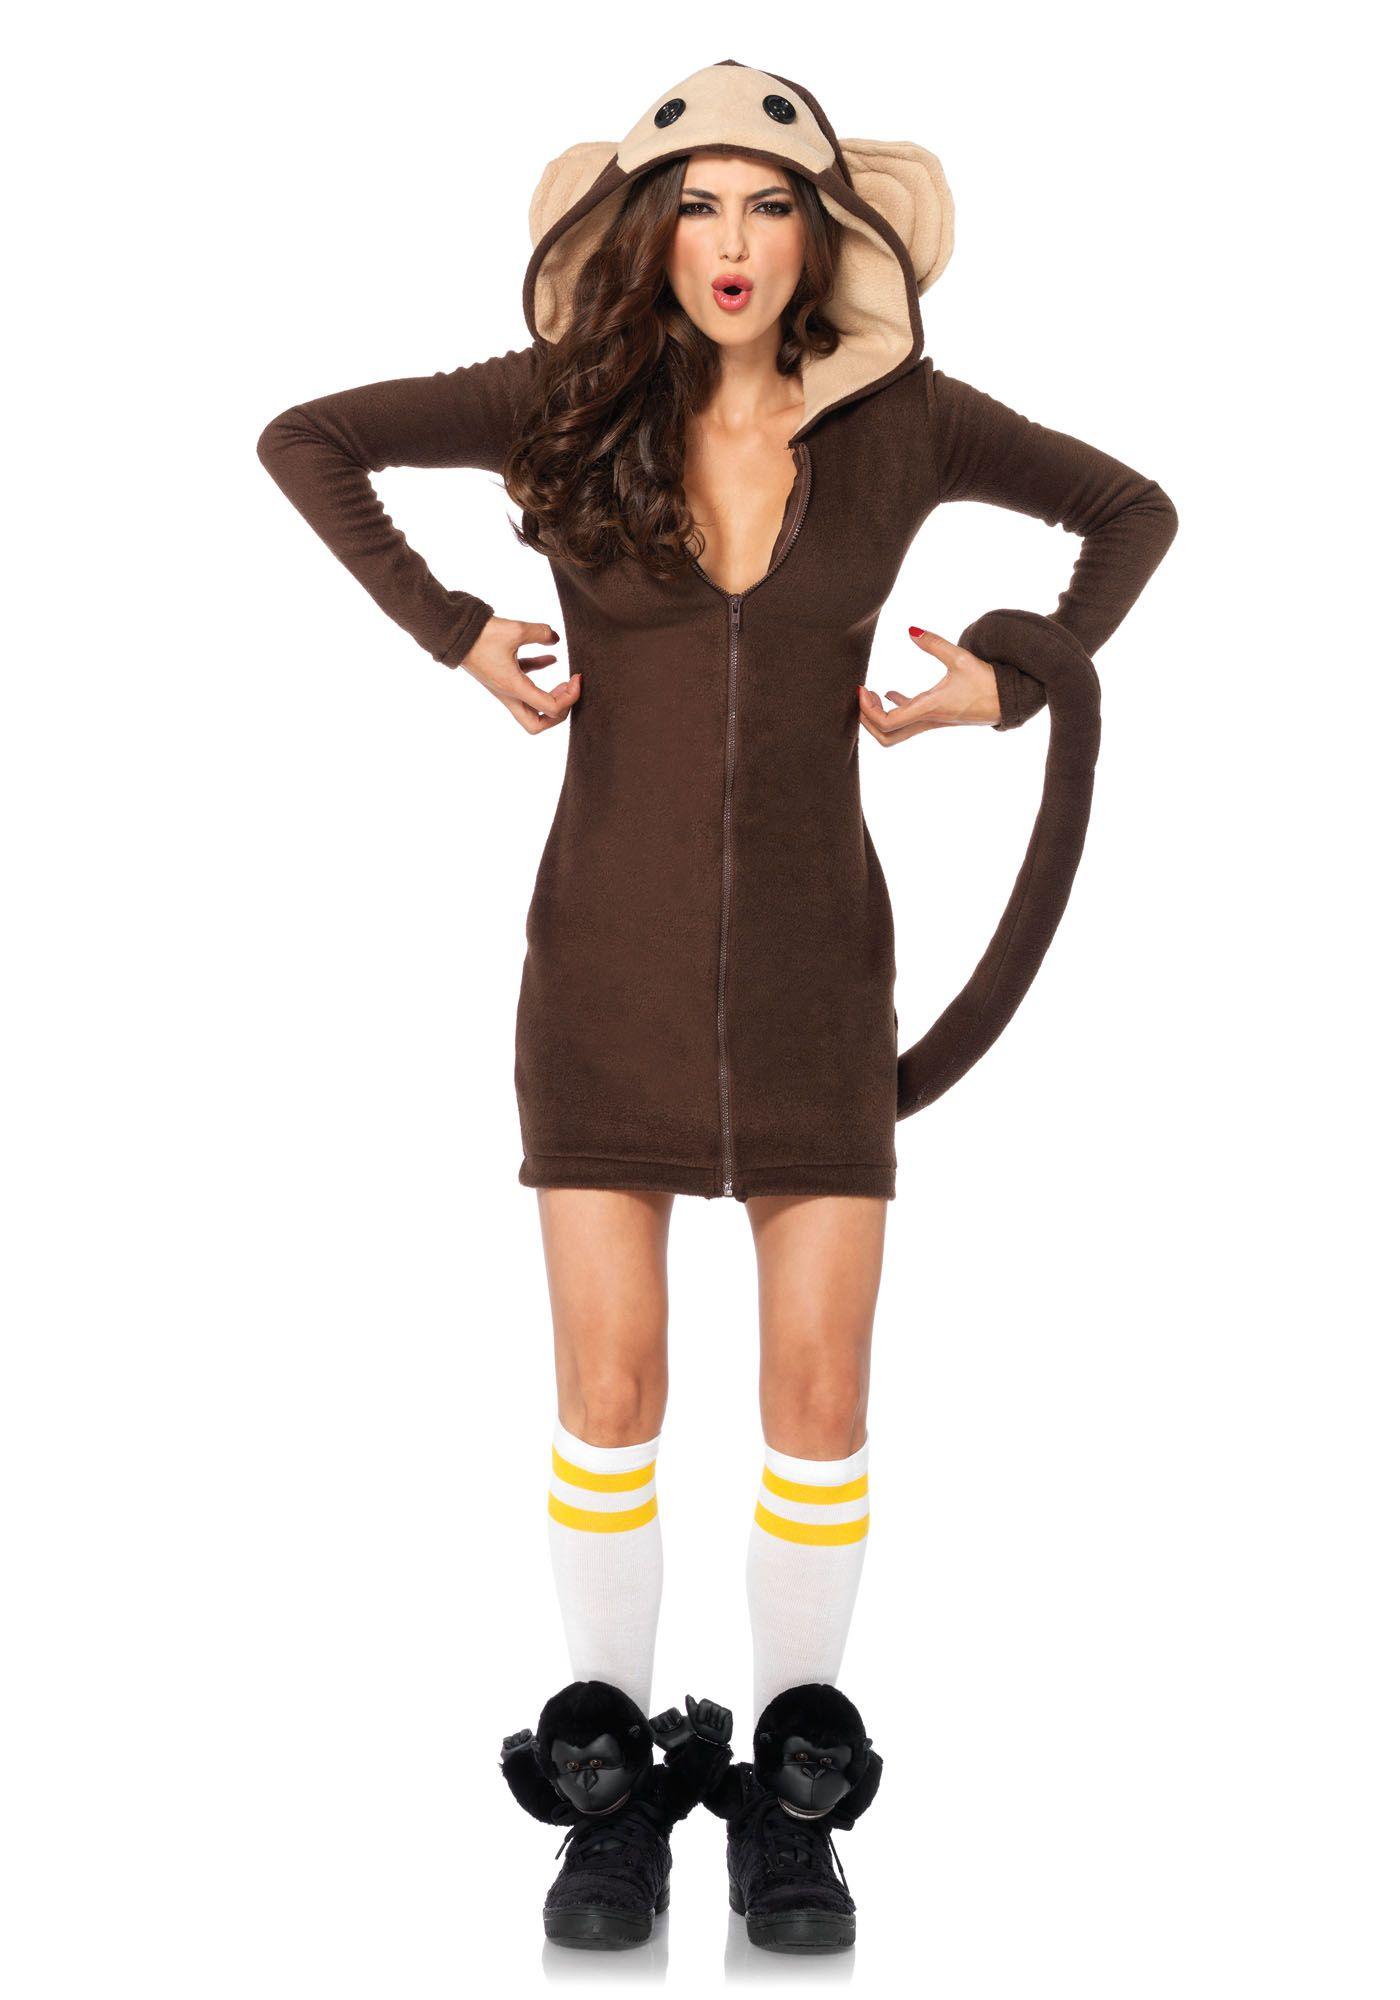 4dda88ff9b2e8 Leg Avenue Cozy Monkey Costume #Zoo #Animal #Jungle | Costumes ...